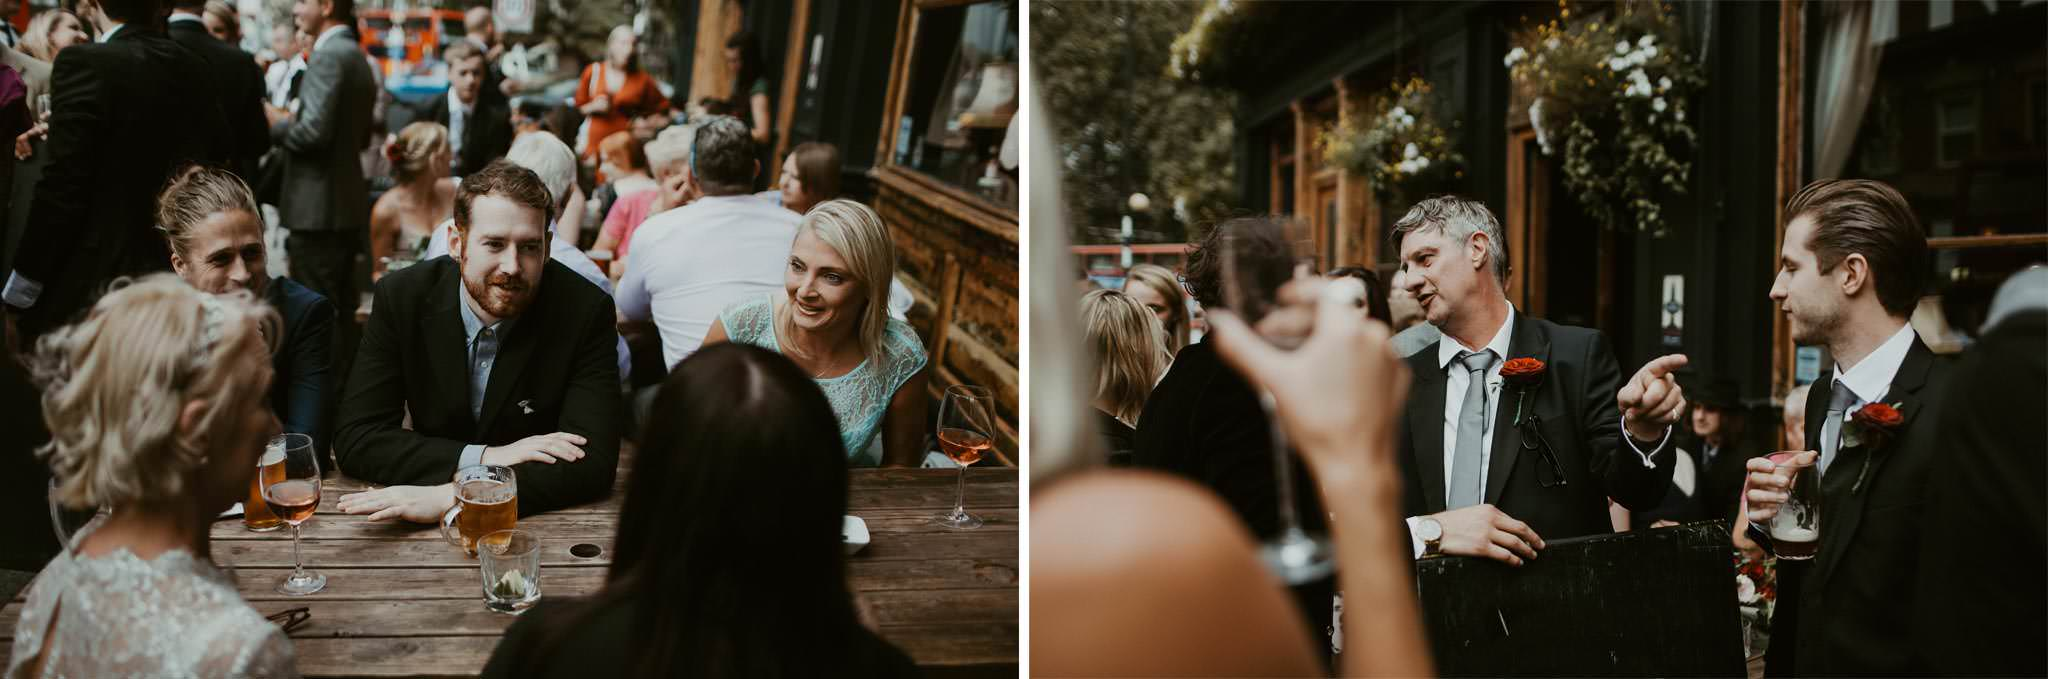 destination-wedding-photographer-158